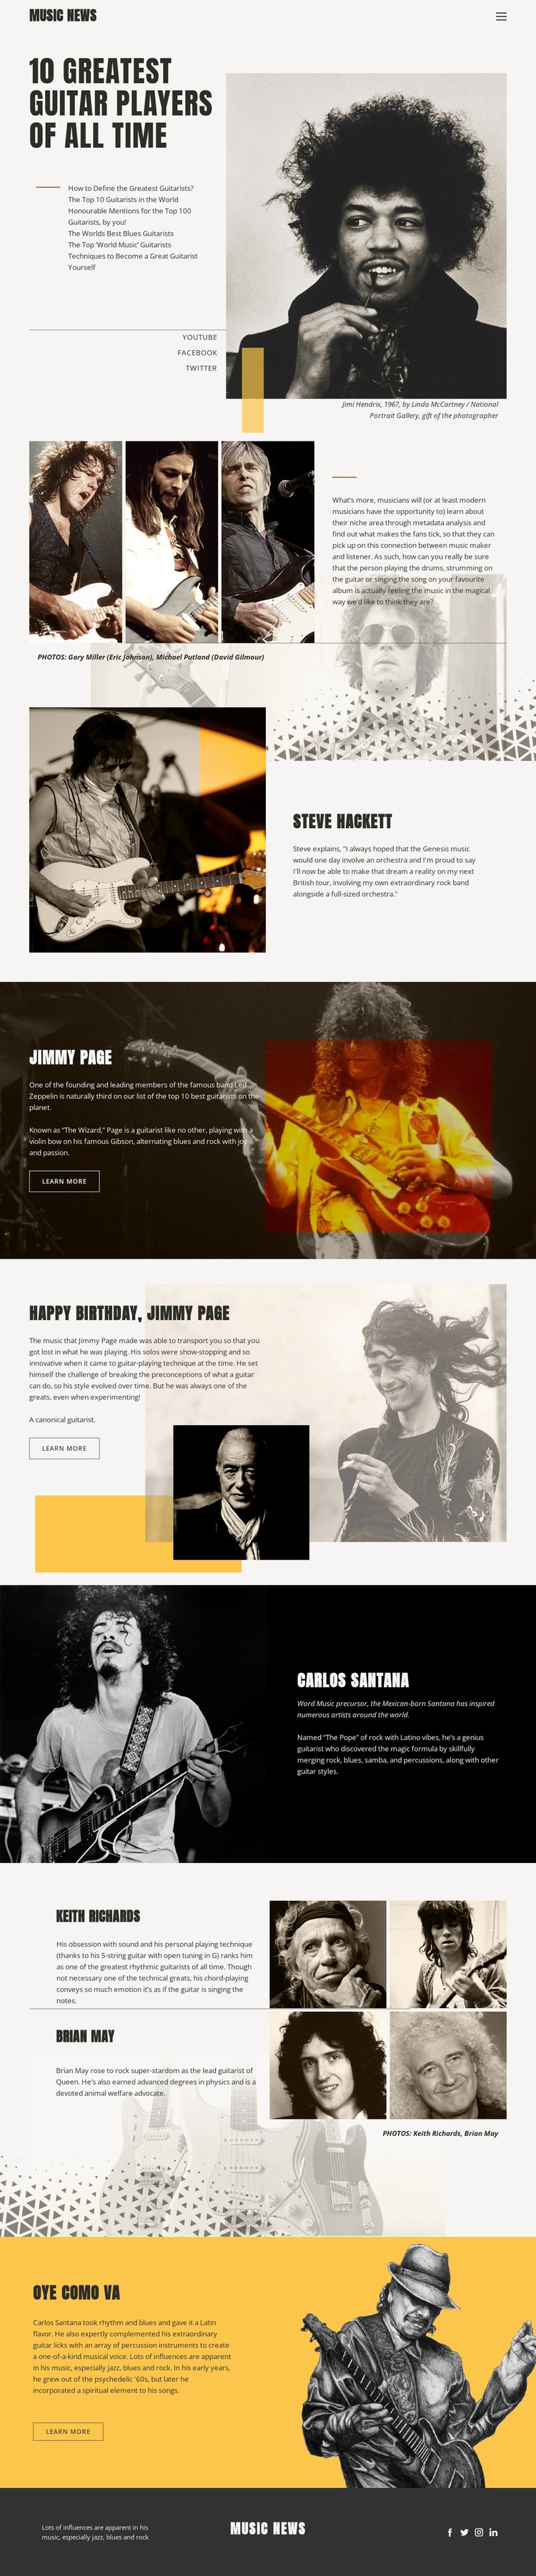 The Top Guitar Players WordPress Theme